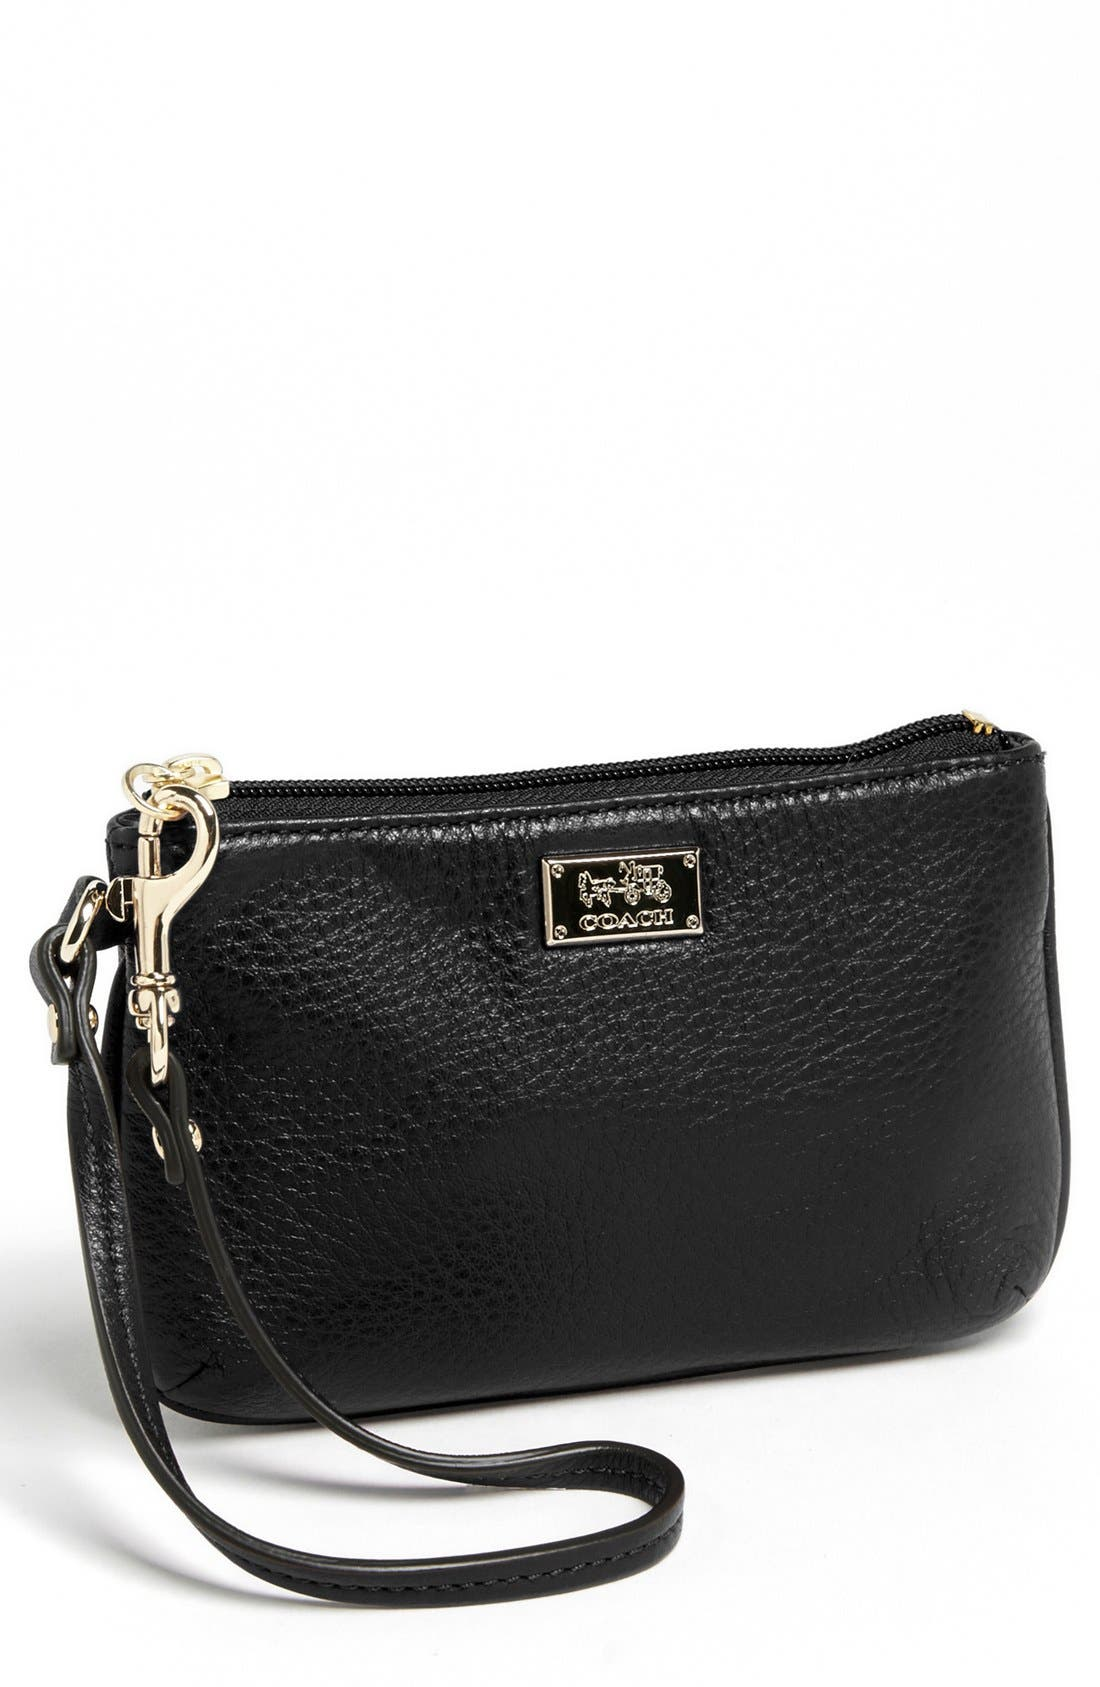 'Madison - Small' Leather Wristlet,                             Main thumbnail 1, color,                             001